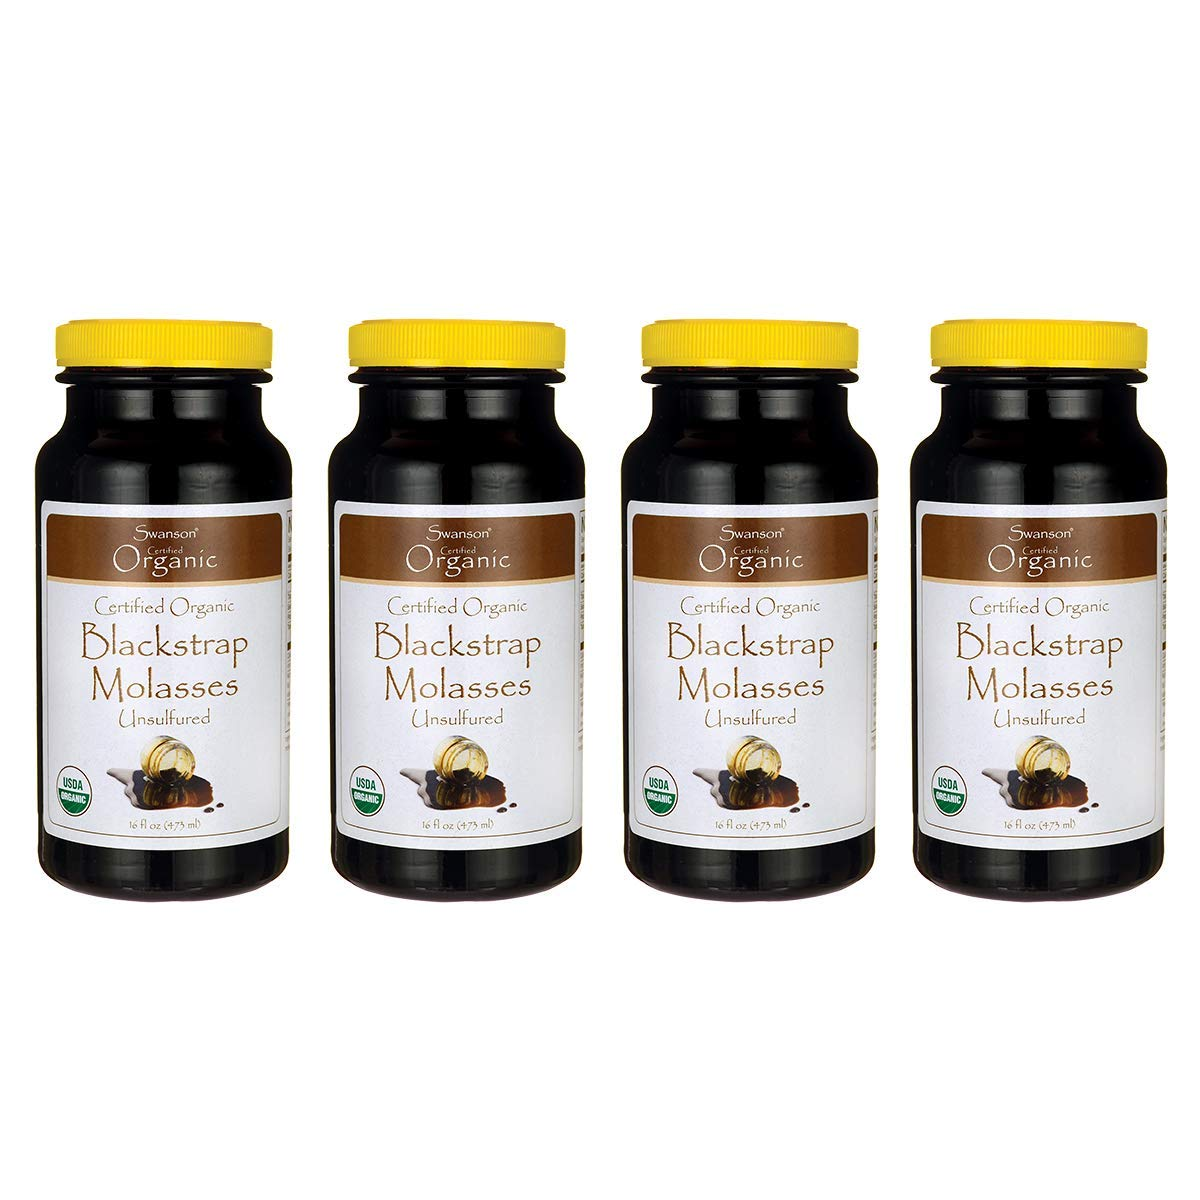 Swanson Certified Organic Blackstrap Molasses 16 fl Ounce (473 ml) Liquid (4 Pack)